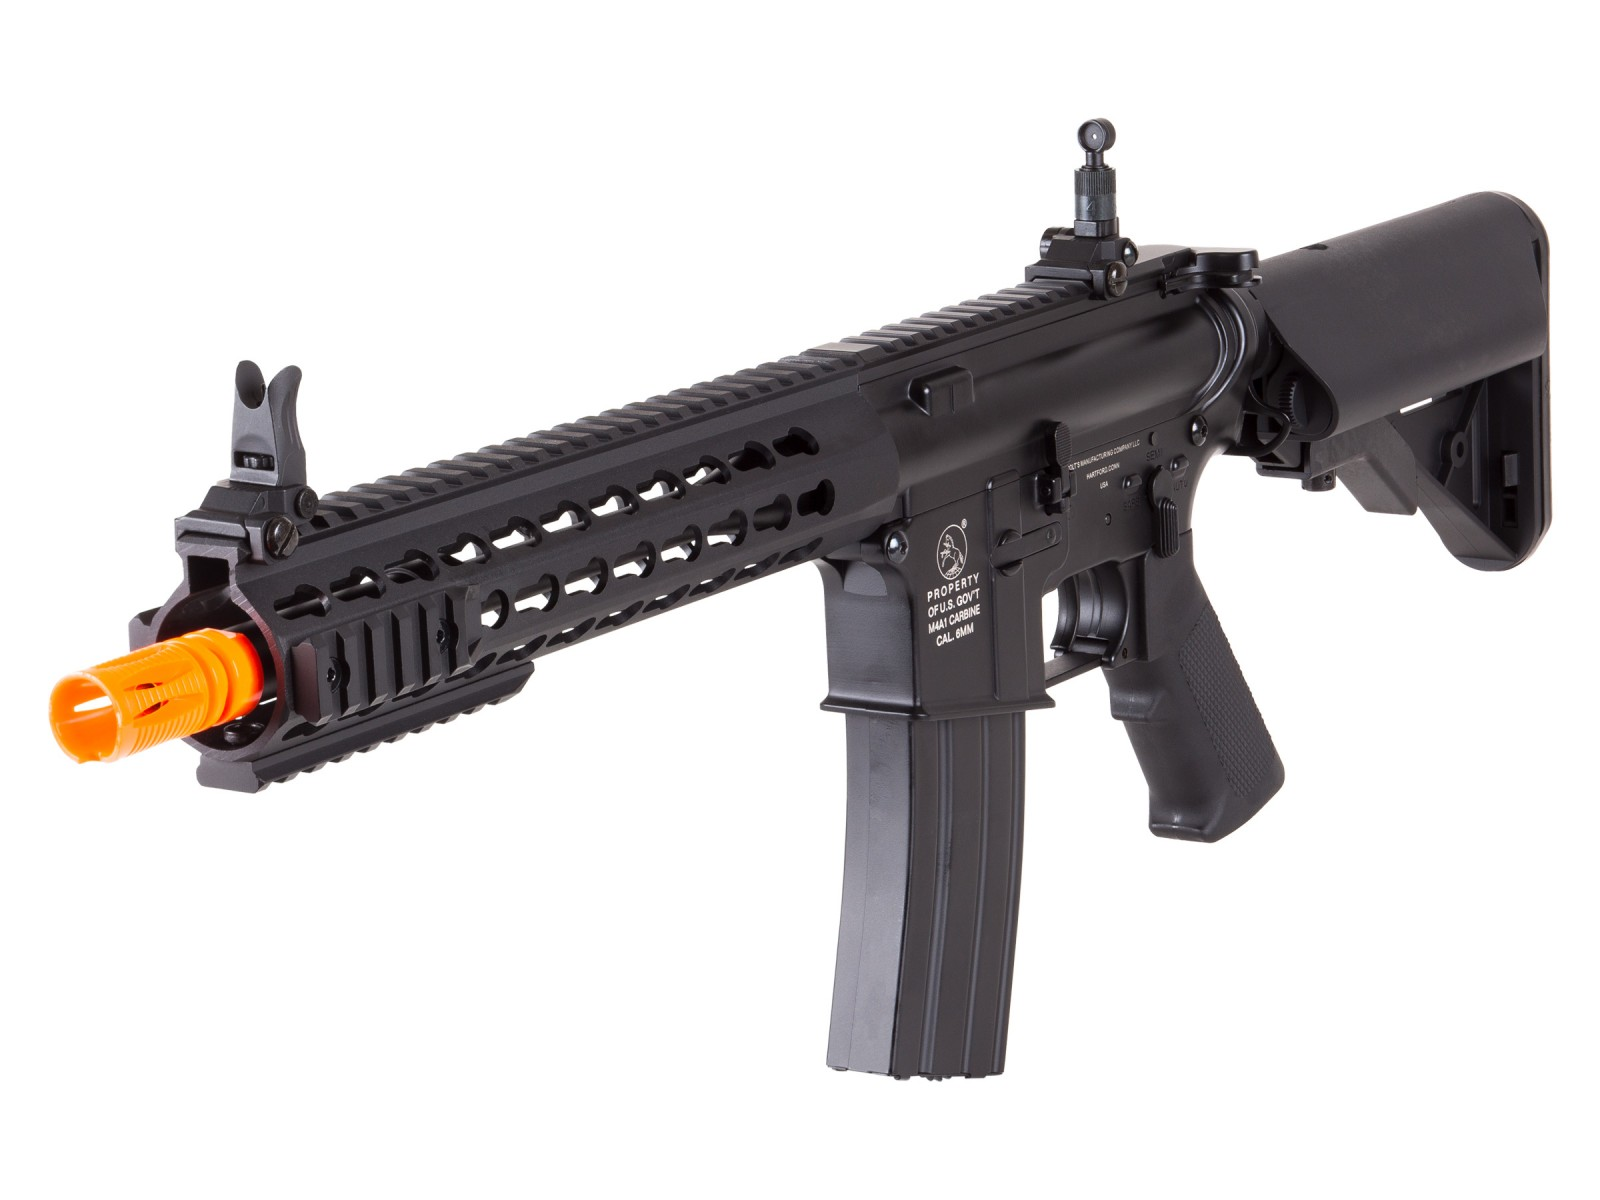 Colt_M4A1_Short_Keymod_Full_Metal_AEG_Rifle_Black_6mm